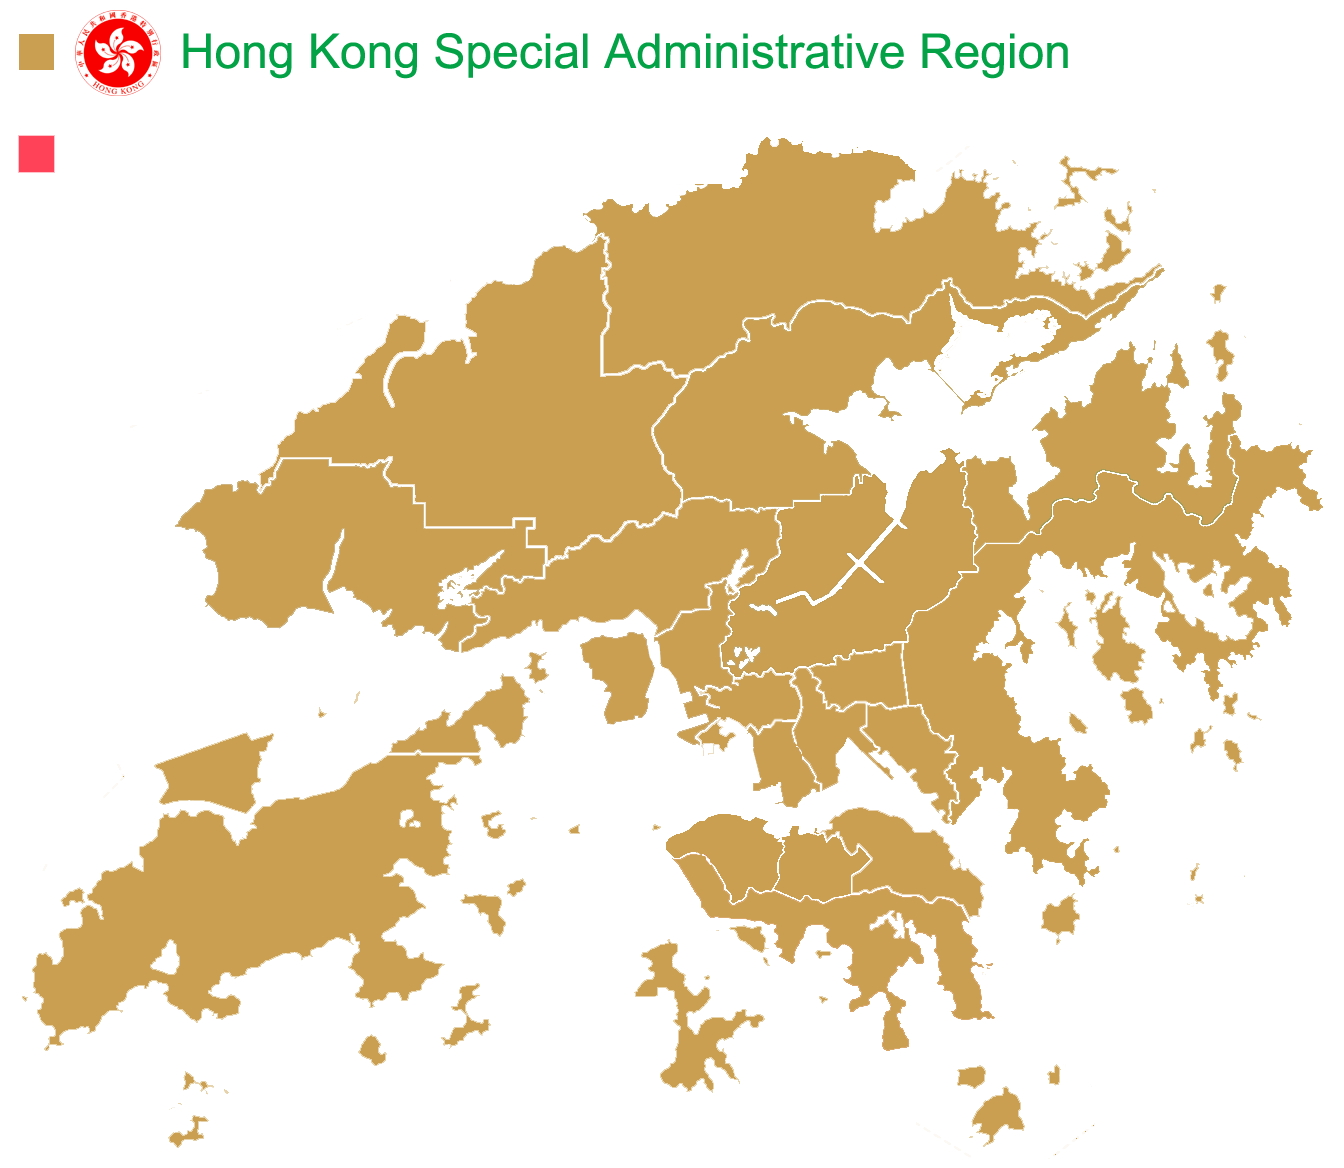 Cartina Hong Kong.File Hong Kong District Locator Template Map Png Wikimedia Commons